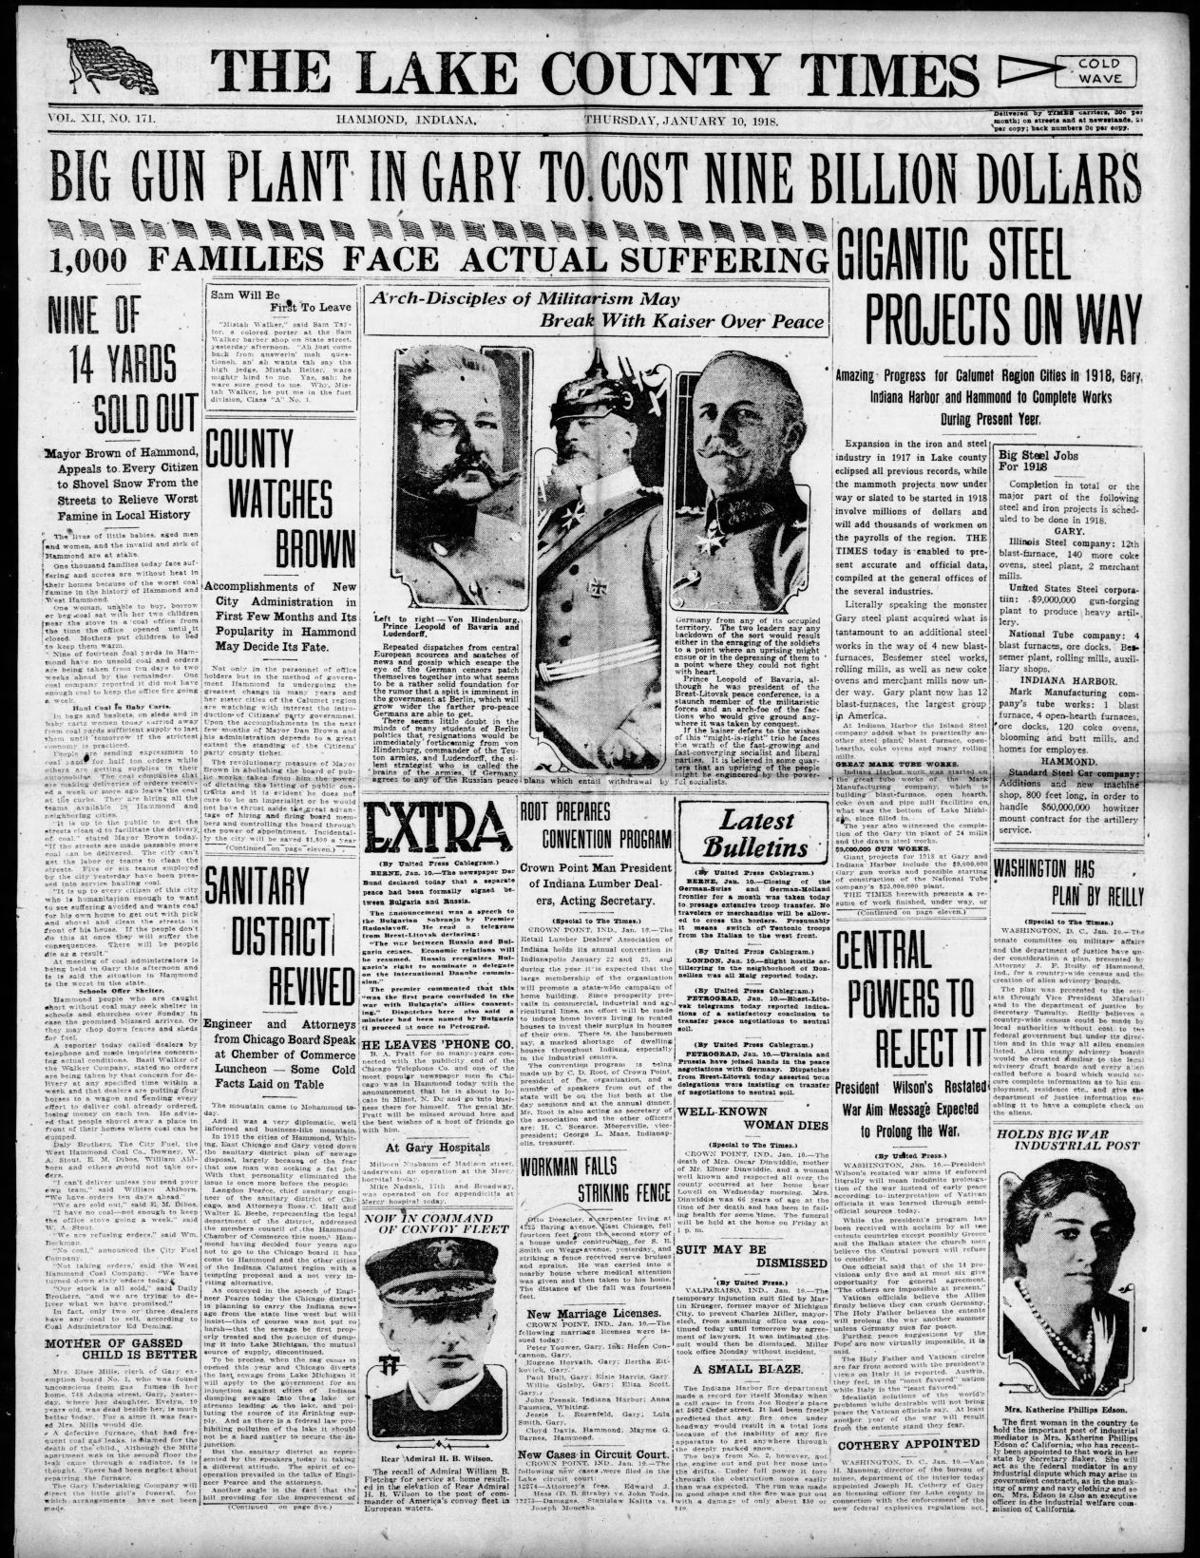 Jan. 10, 1918: Big Gun Plant in Gary to Cost Nine Billion Dollars